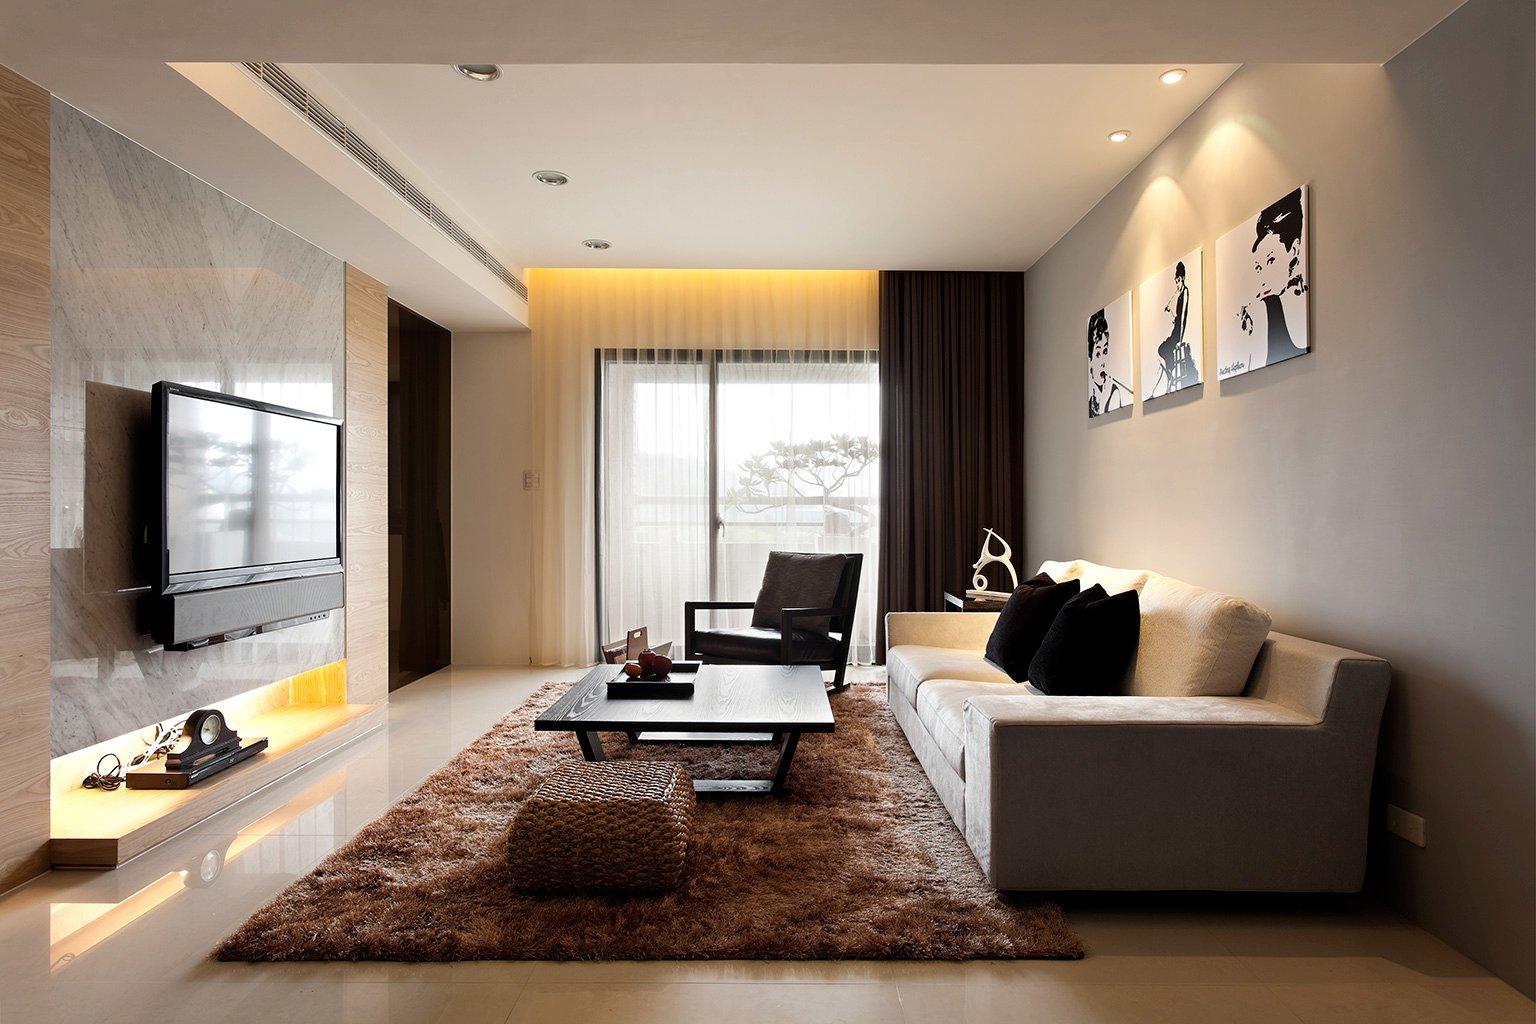 Modern Minimalist Decor With A Homey Flow